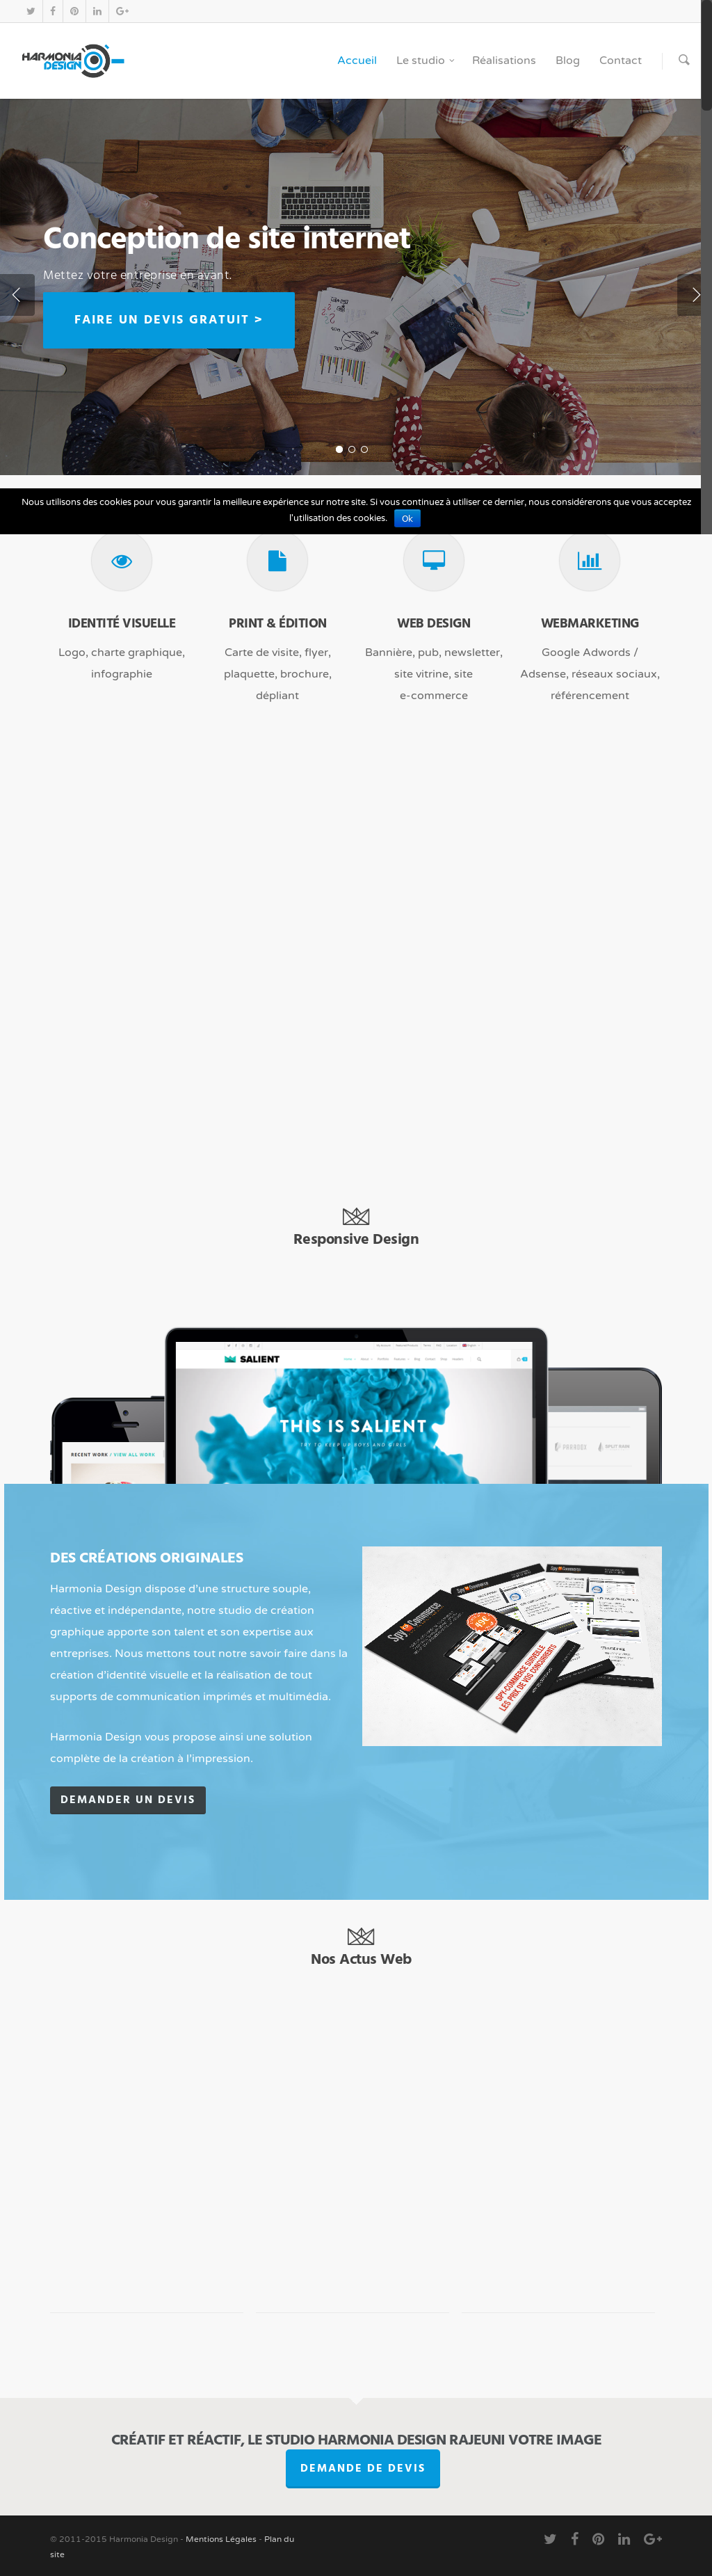 Harmonia Design Competitors, Revenue and Employees - Owler